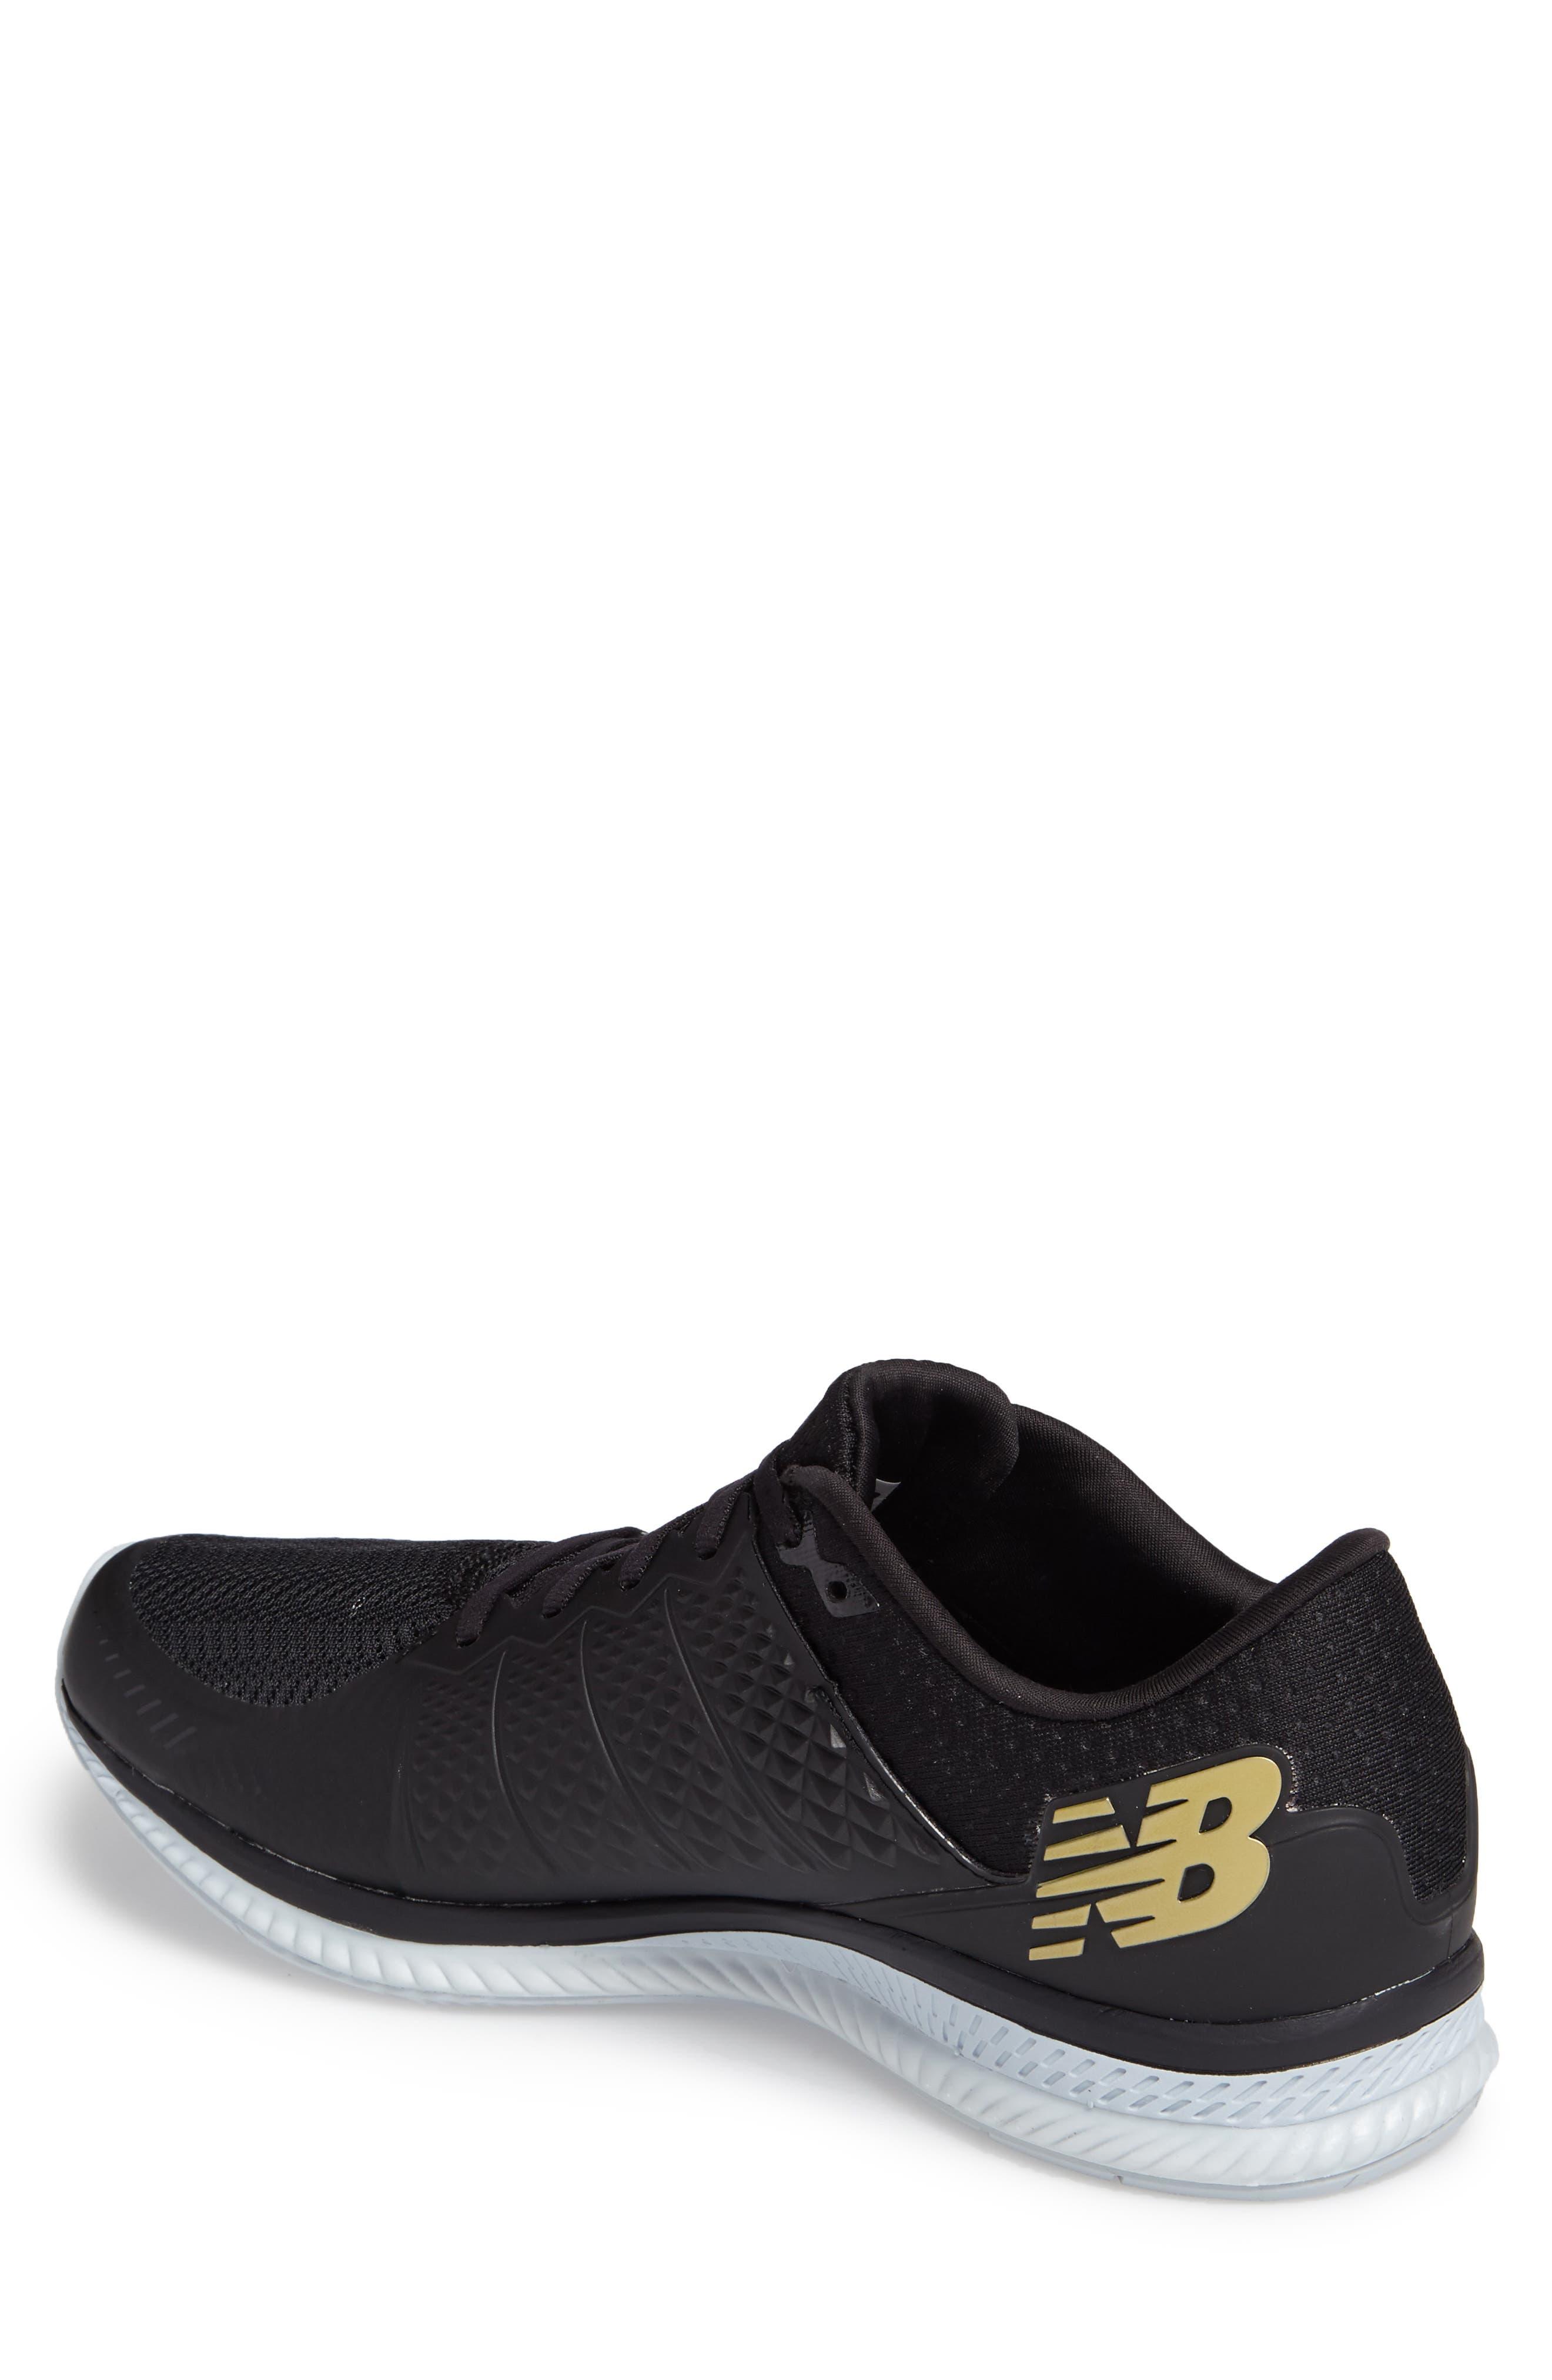 Vazee Fuel Cell Running Shoe,                             Alternate thumbnail 2, color,                             Black